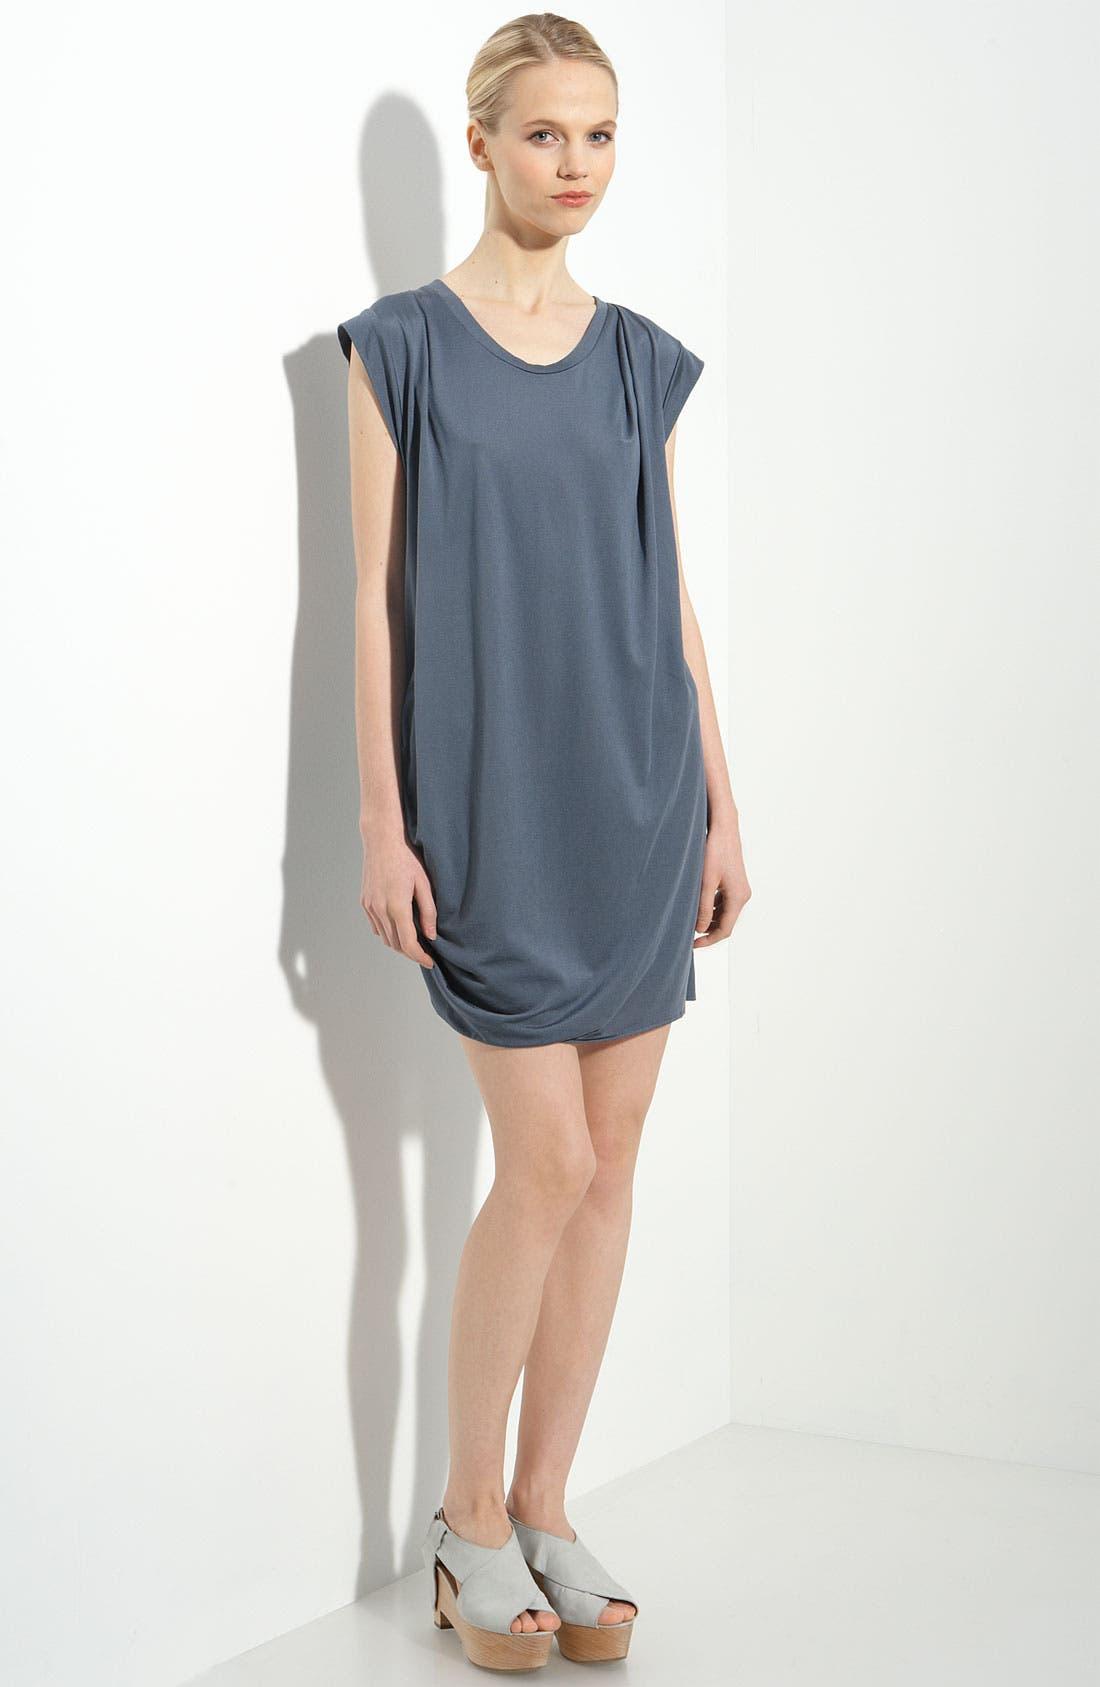 Main Image - 3.1 Phillip Lim Jersey T-Shirt Dress